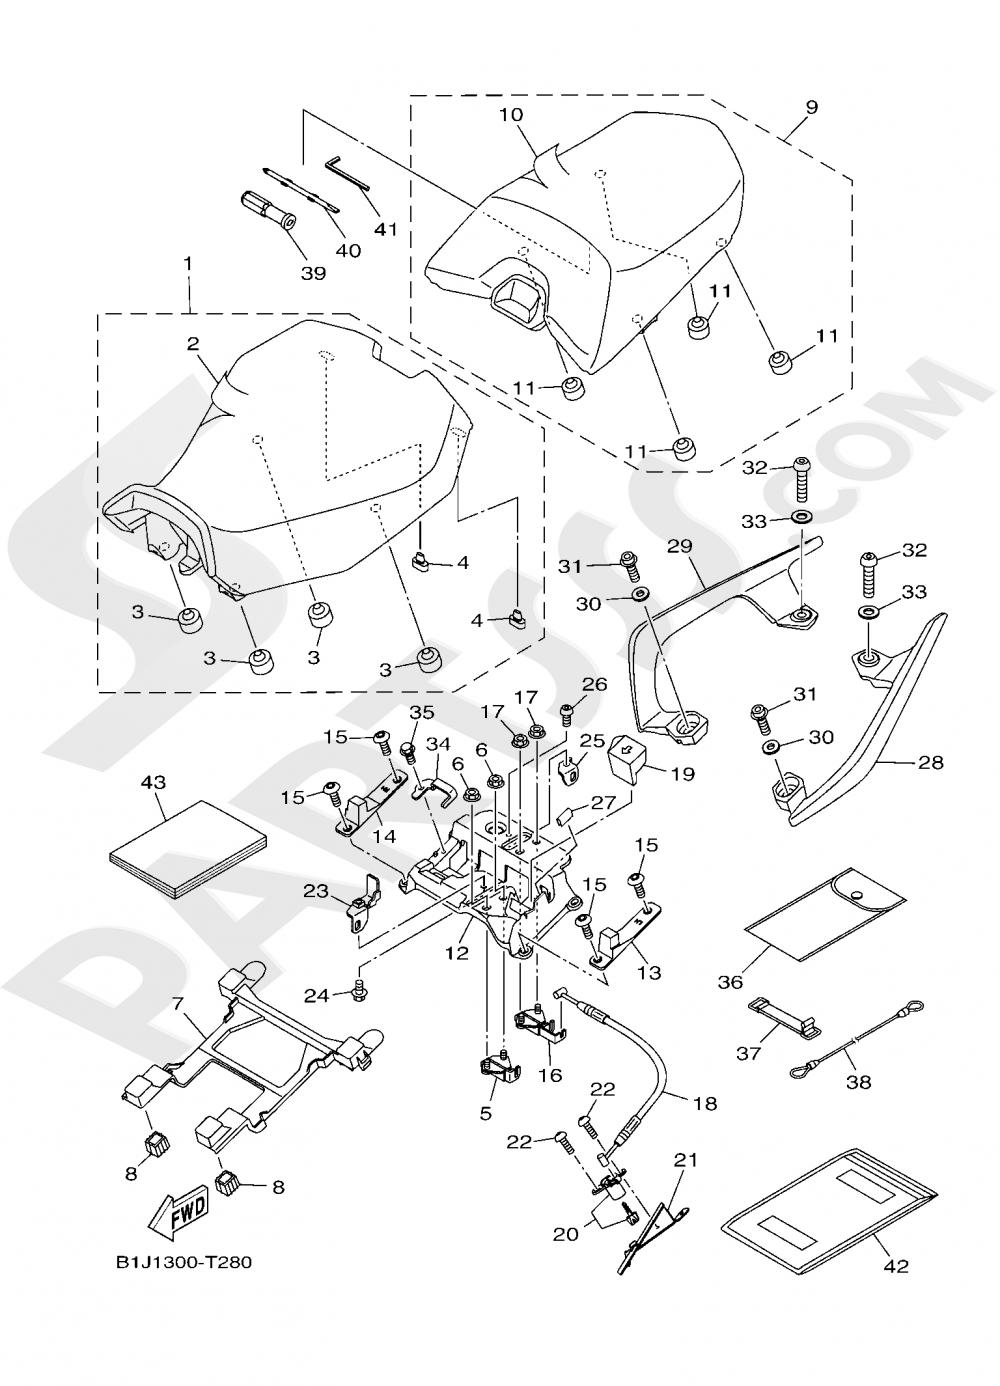 SEAT Yamaha TRACER 900 GT 2019